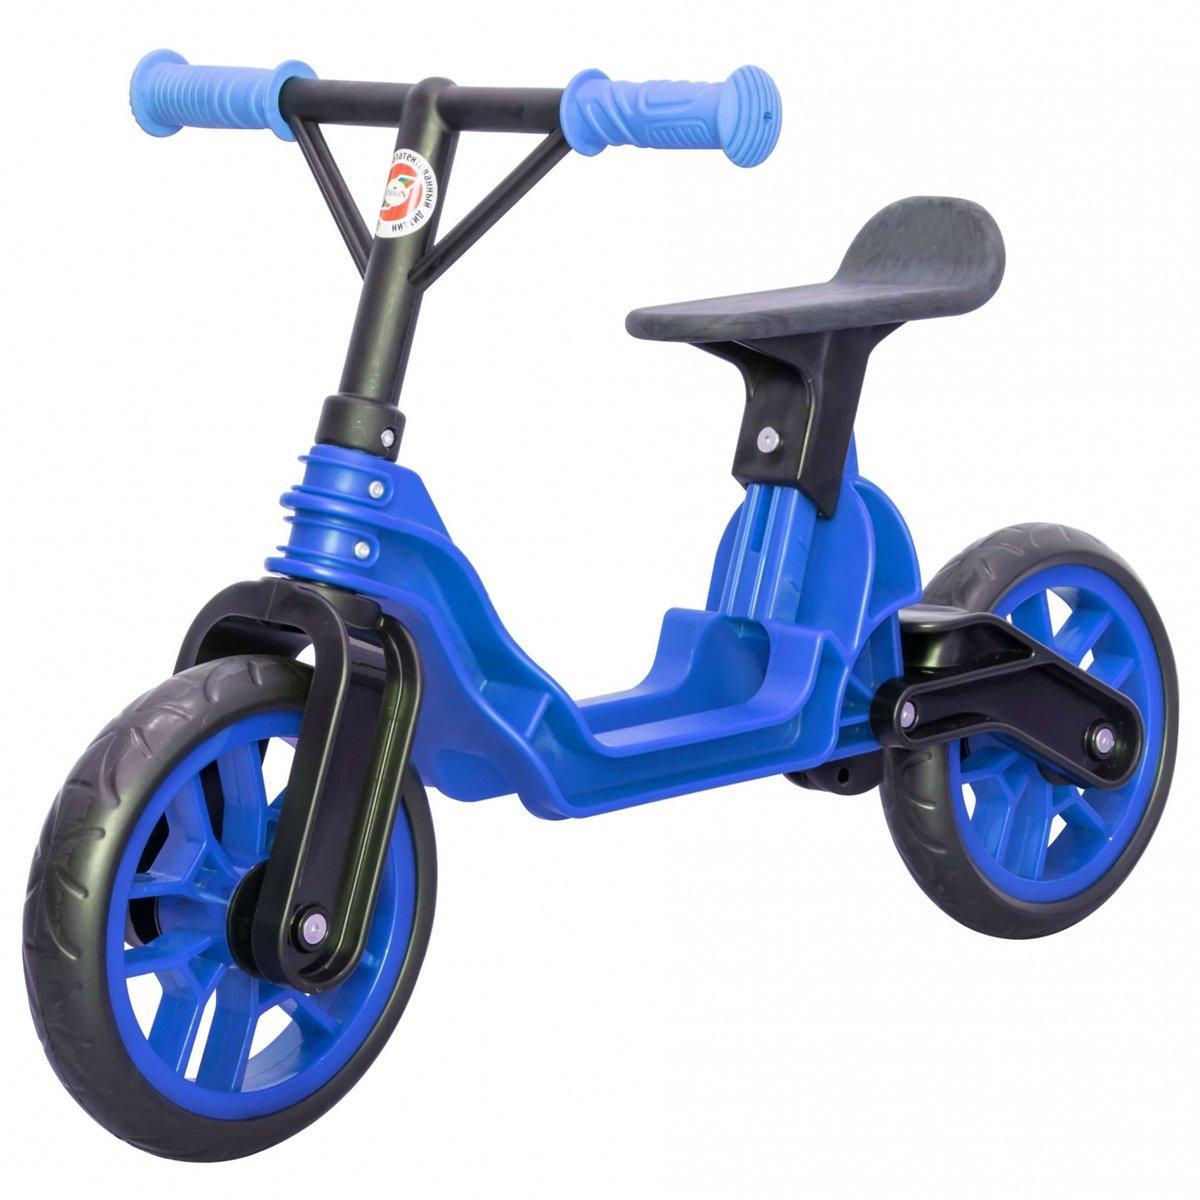 Детский беговел Байк 503 ORION , синий